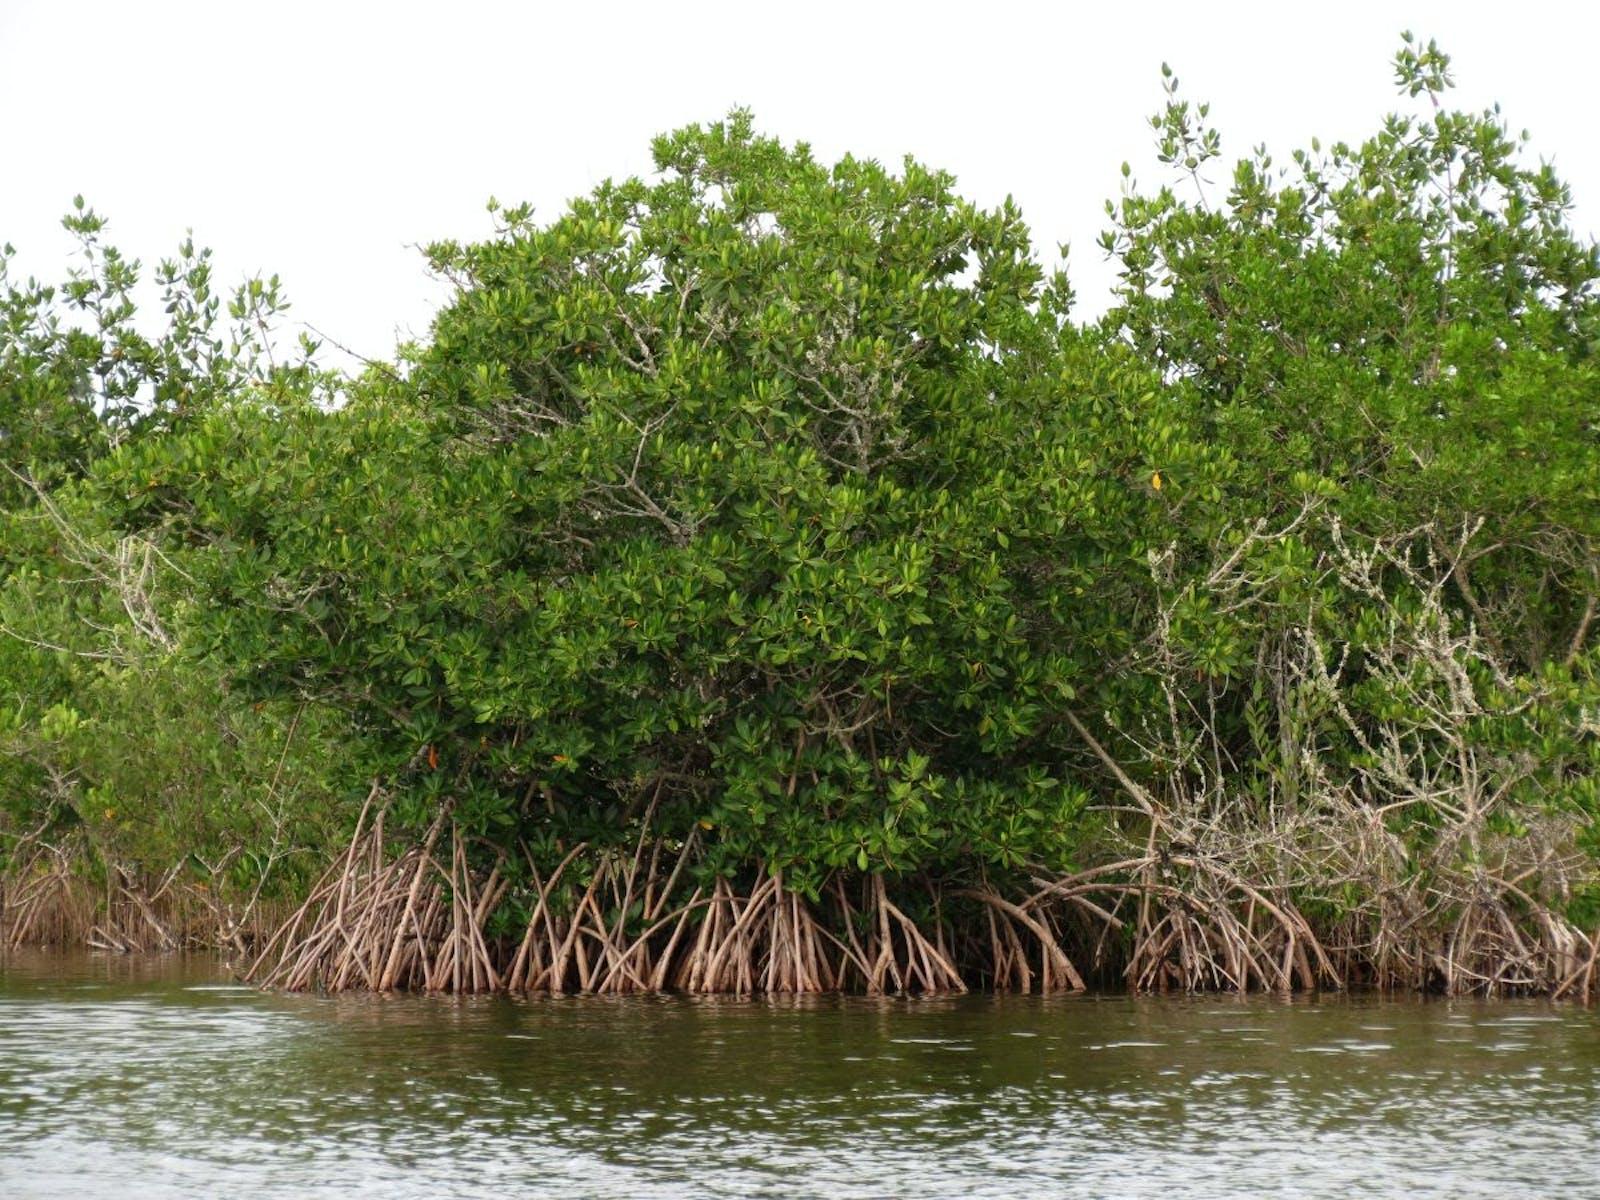 Southern Atlantic Brazilian Mangroves